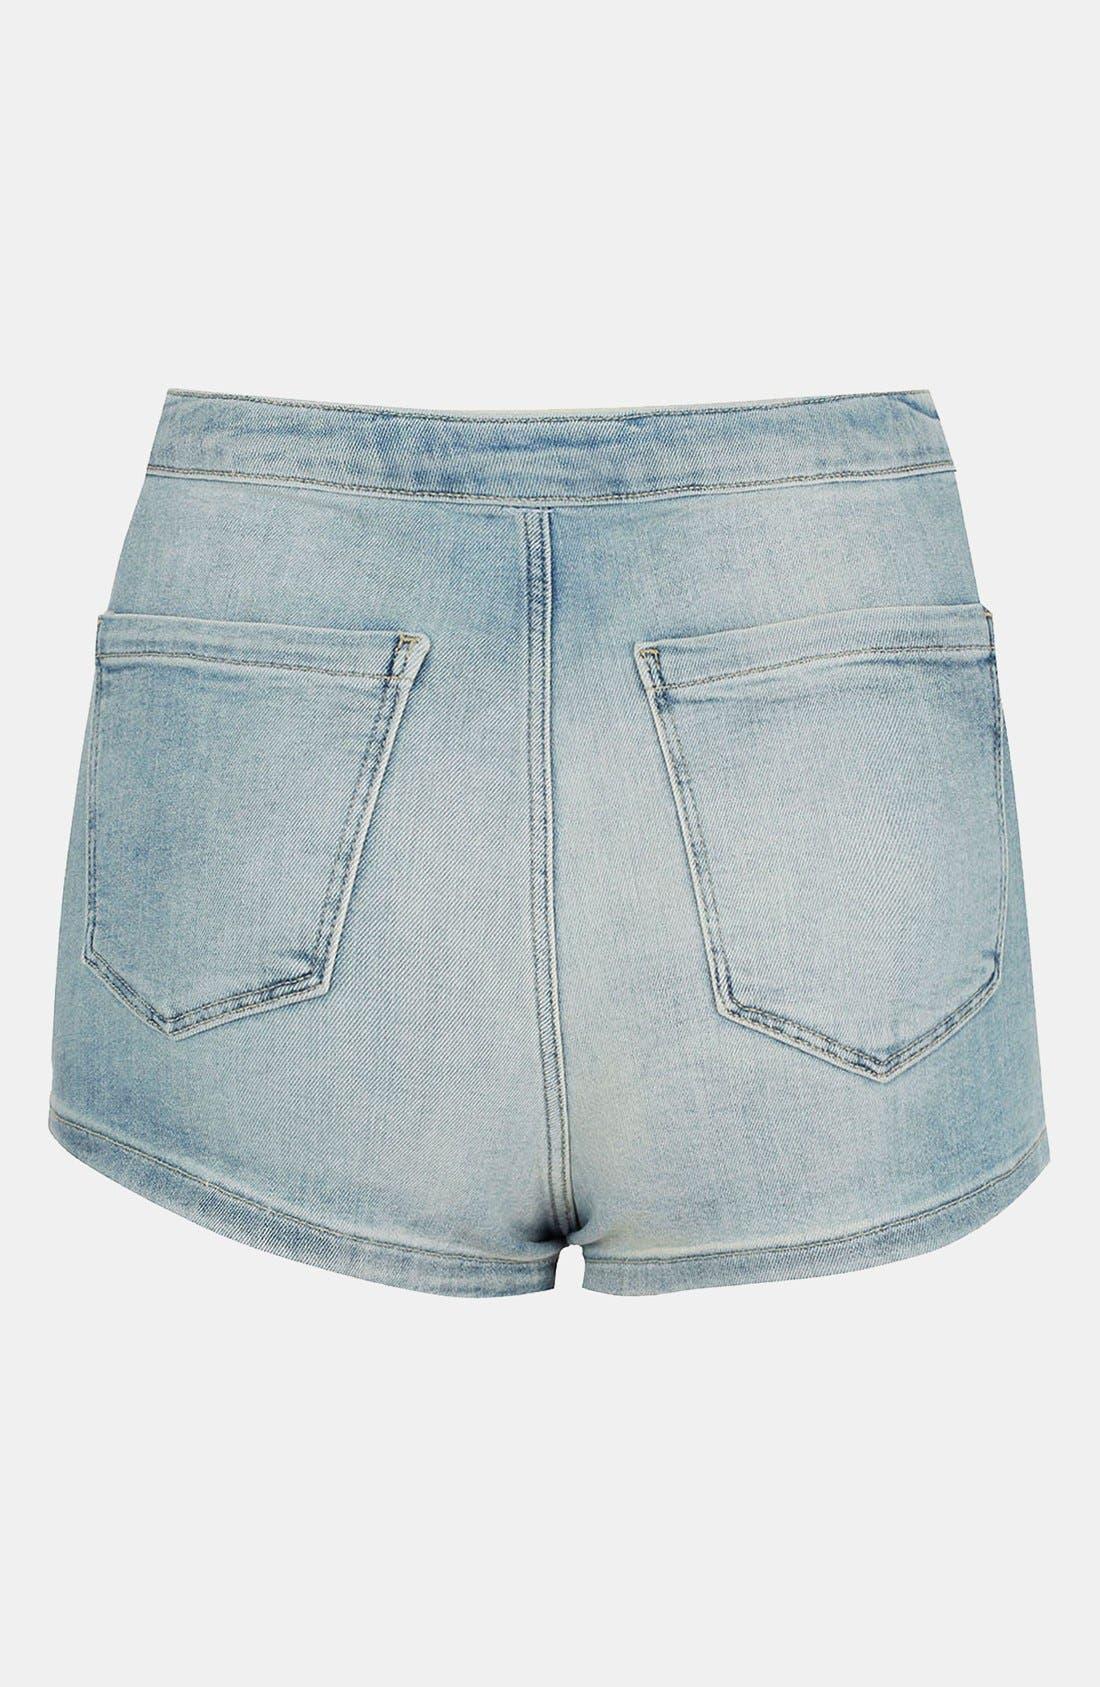 Moto 'Francis' Denim Hot Pants,                             Alternate thumbnail 2, color,                             450